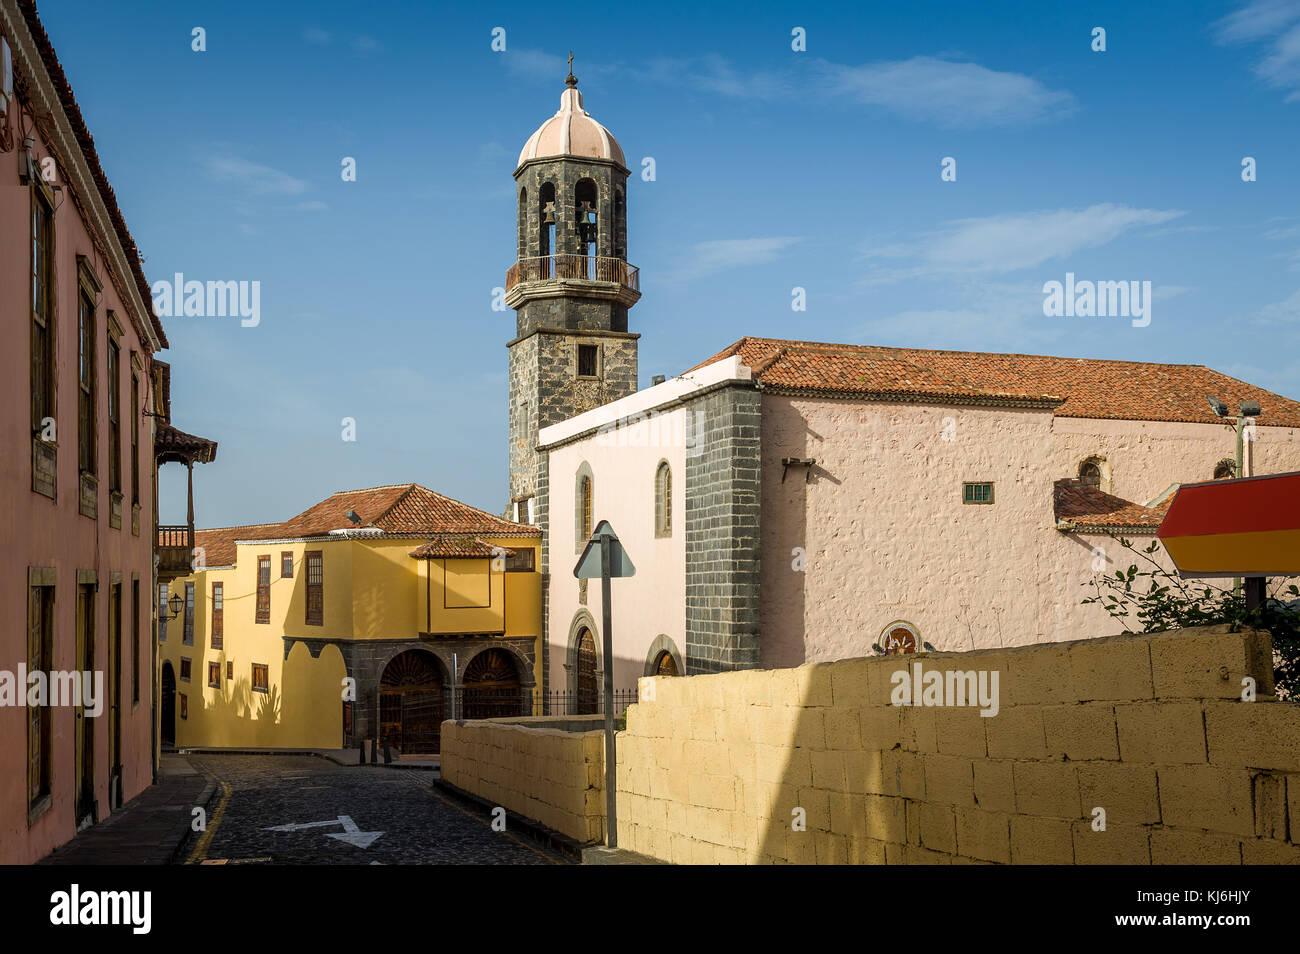 Orotava old town, Tenerife - Stock Image